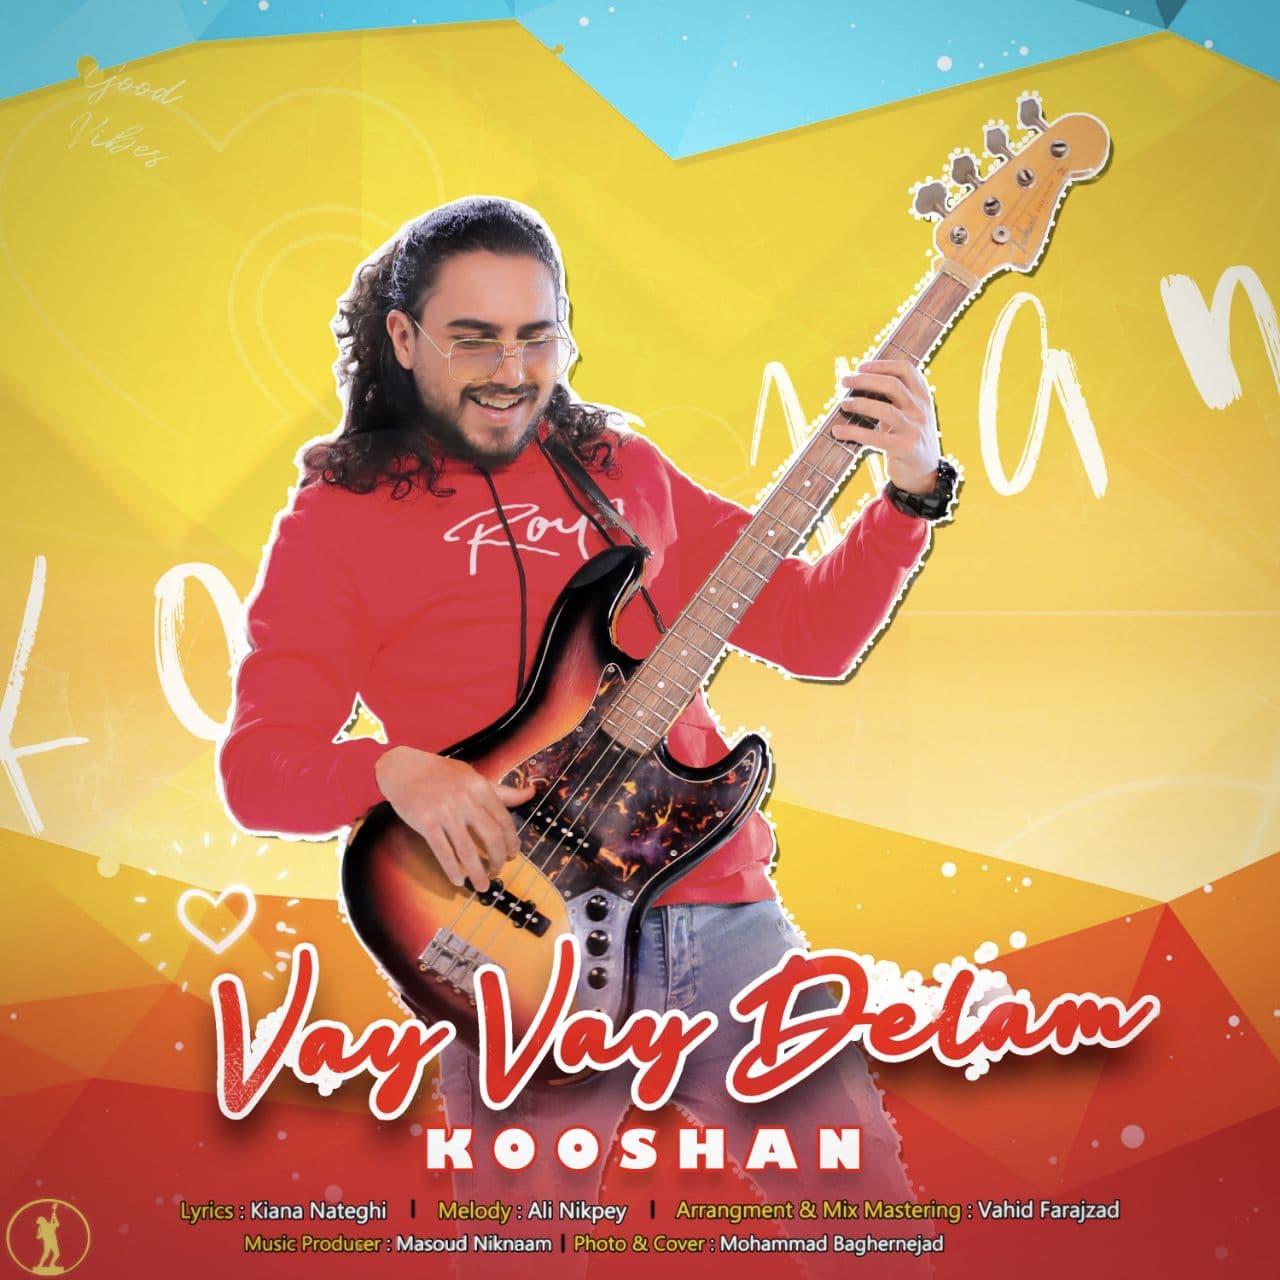 Kooshan – Vay Vay Delam